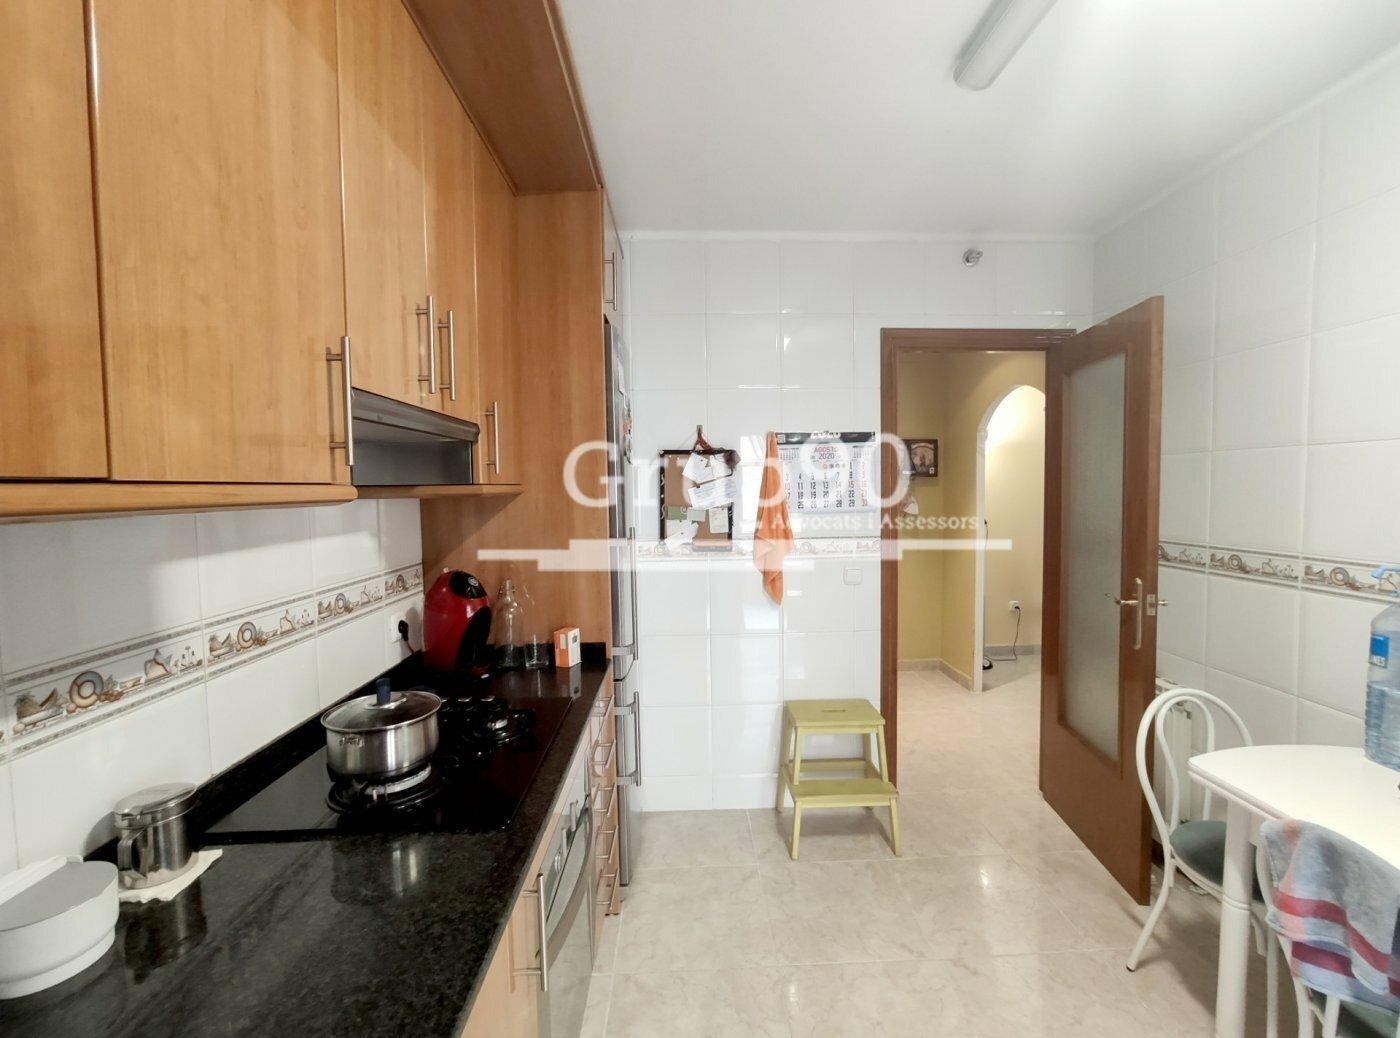 Apartamento, CAPPONT, Venta - Lleida (Lleida)